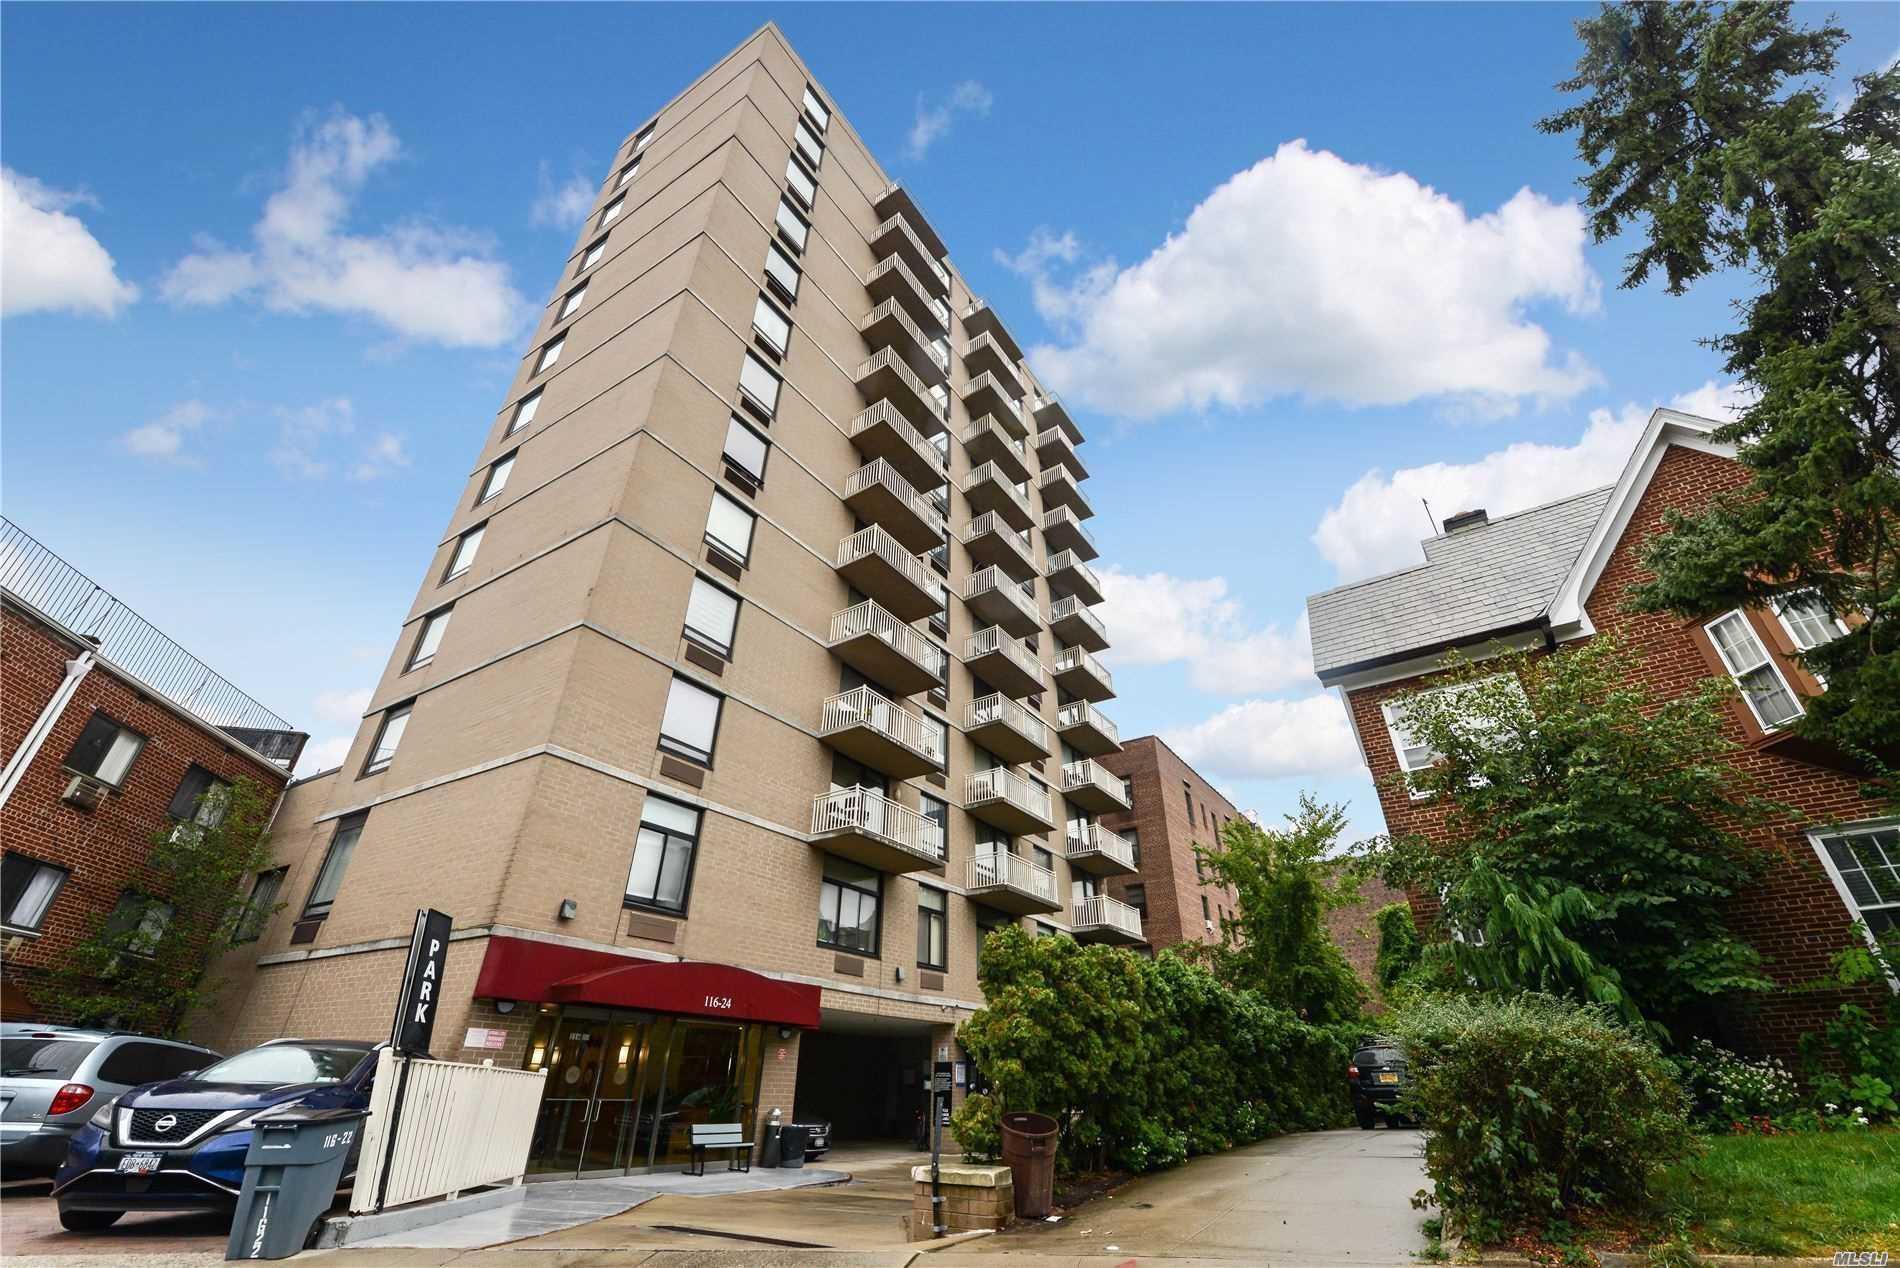 Property for sale at 116-24 Grosvenor Lane # 7A, Kew Gardens NY 11415, Kew Gardens,  New York 11415